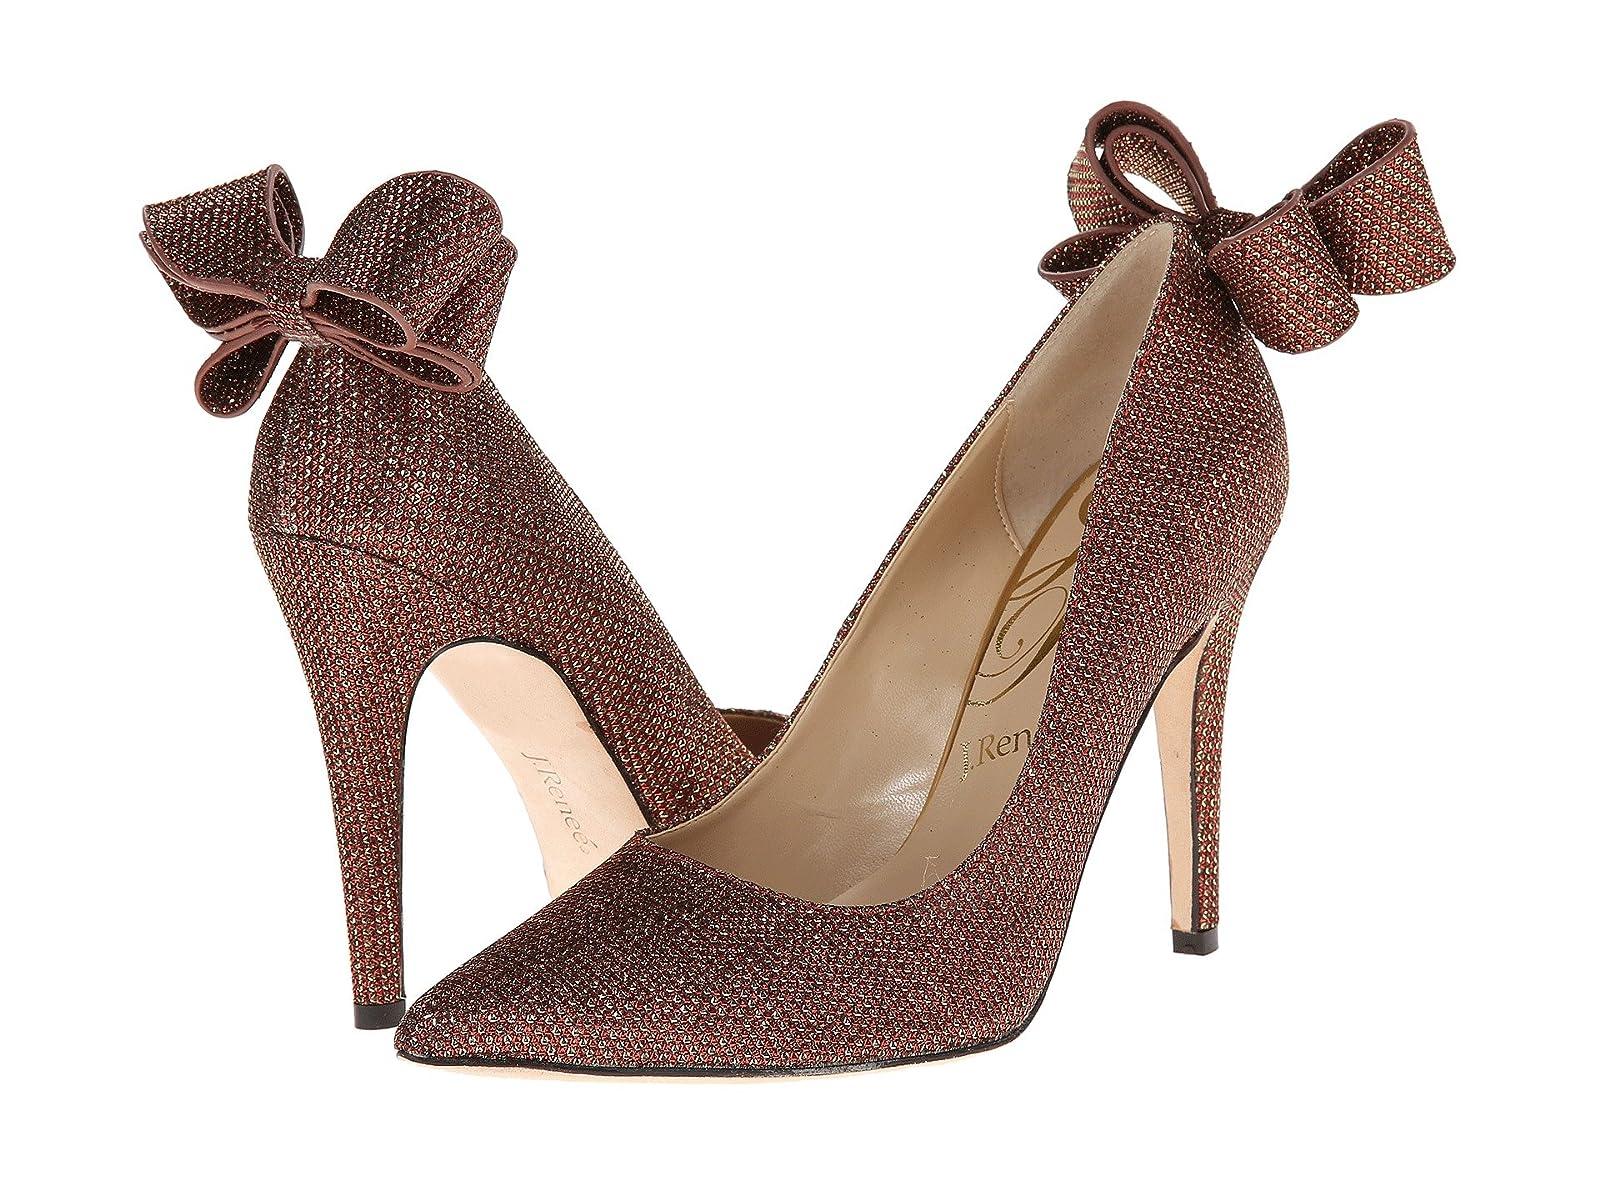 J. Renee KeteCheap and distinctive eye-catching shoes